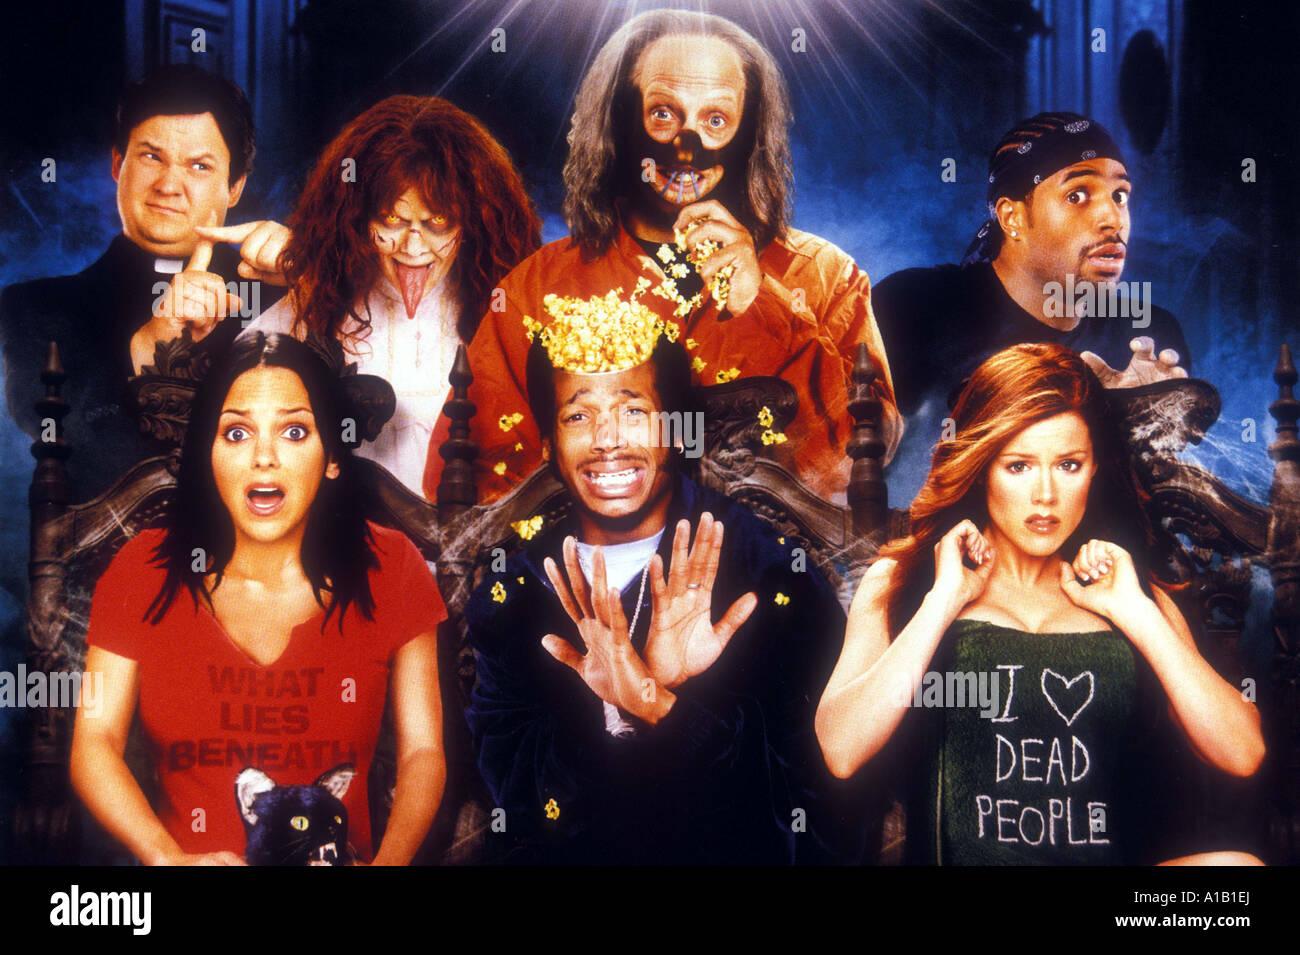 Scary Movie Scary Movie Ivory Stockfotos & Scary Movie Scary Movie ...